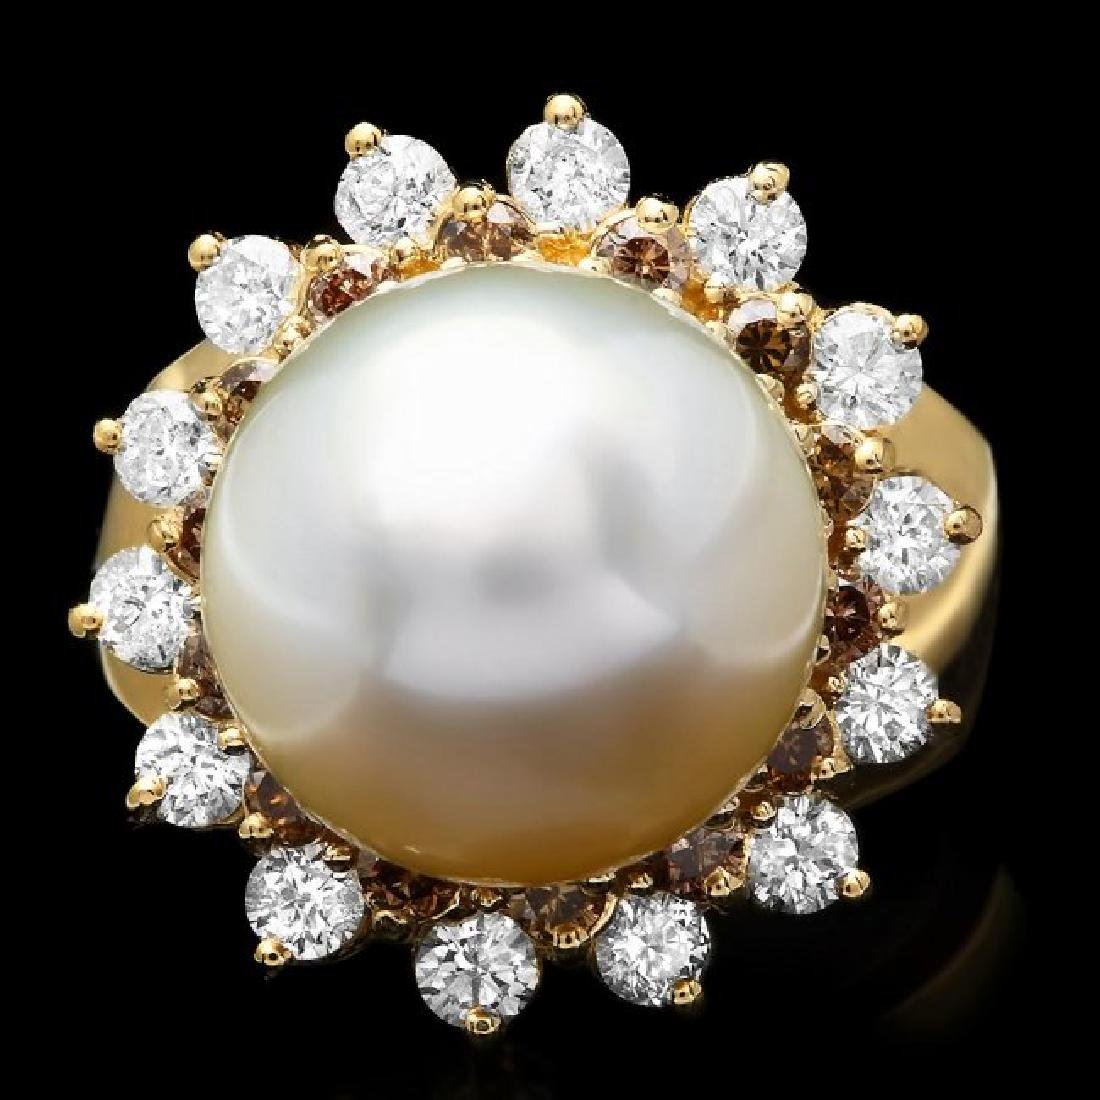 14k Yellow Gold 13mm Pearl 1.6ct Diamond Ring